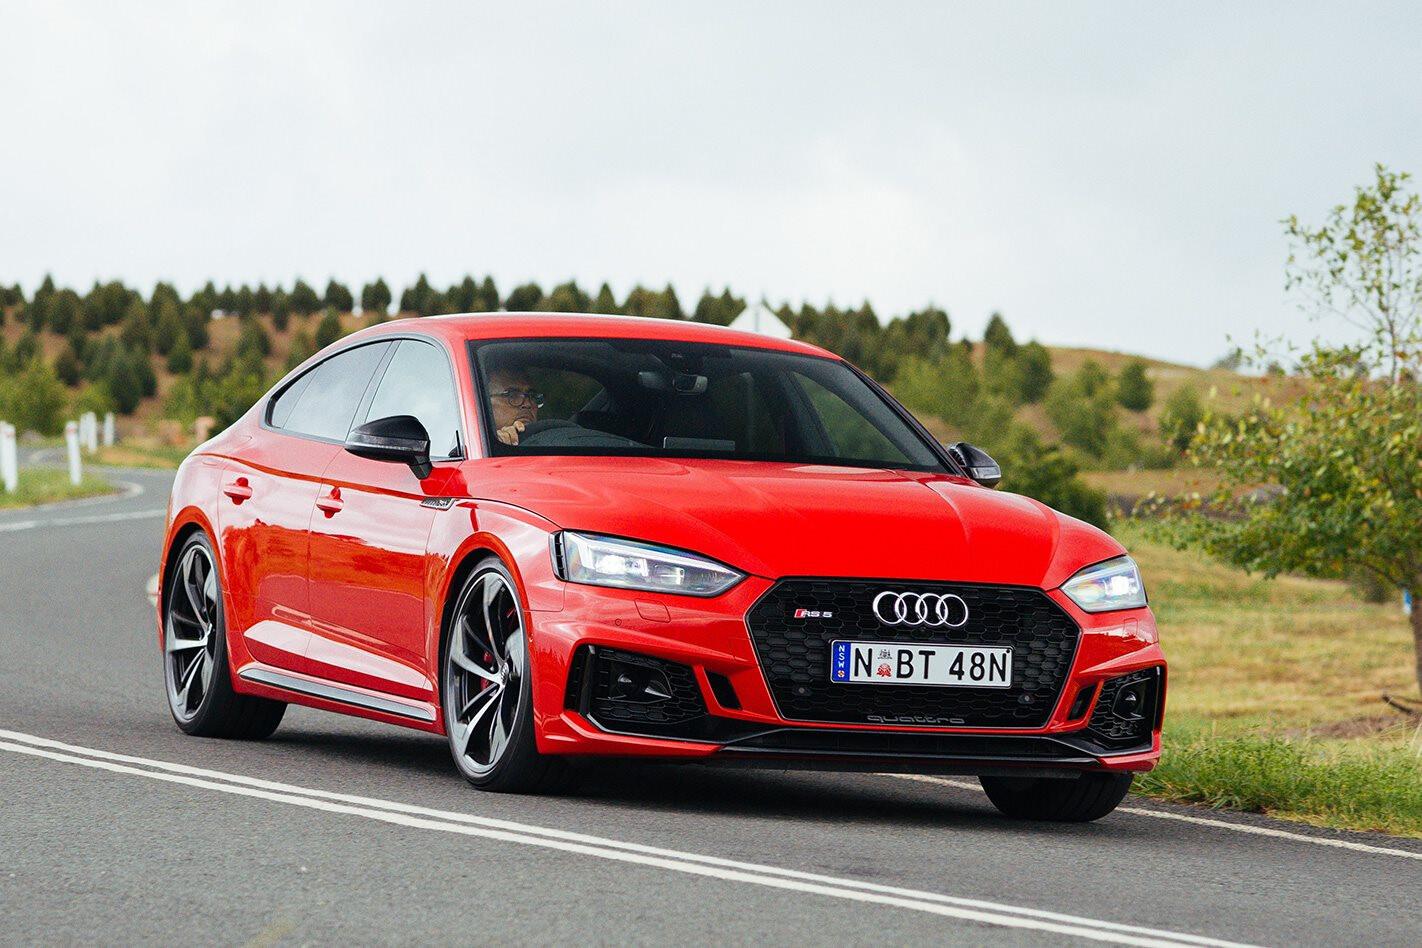 Audi Rs 5 Bonici Jpg